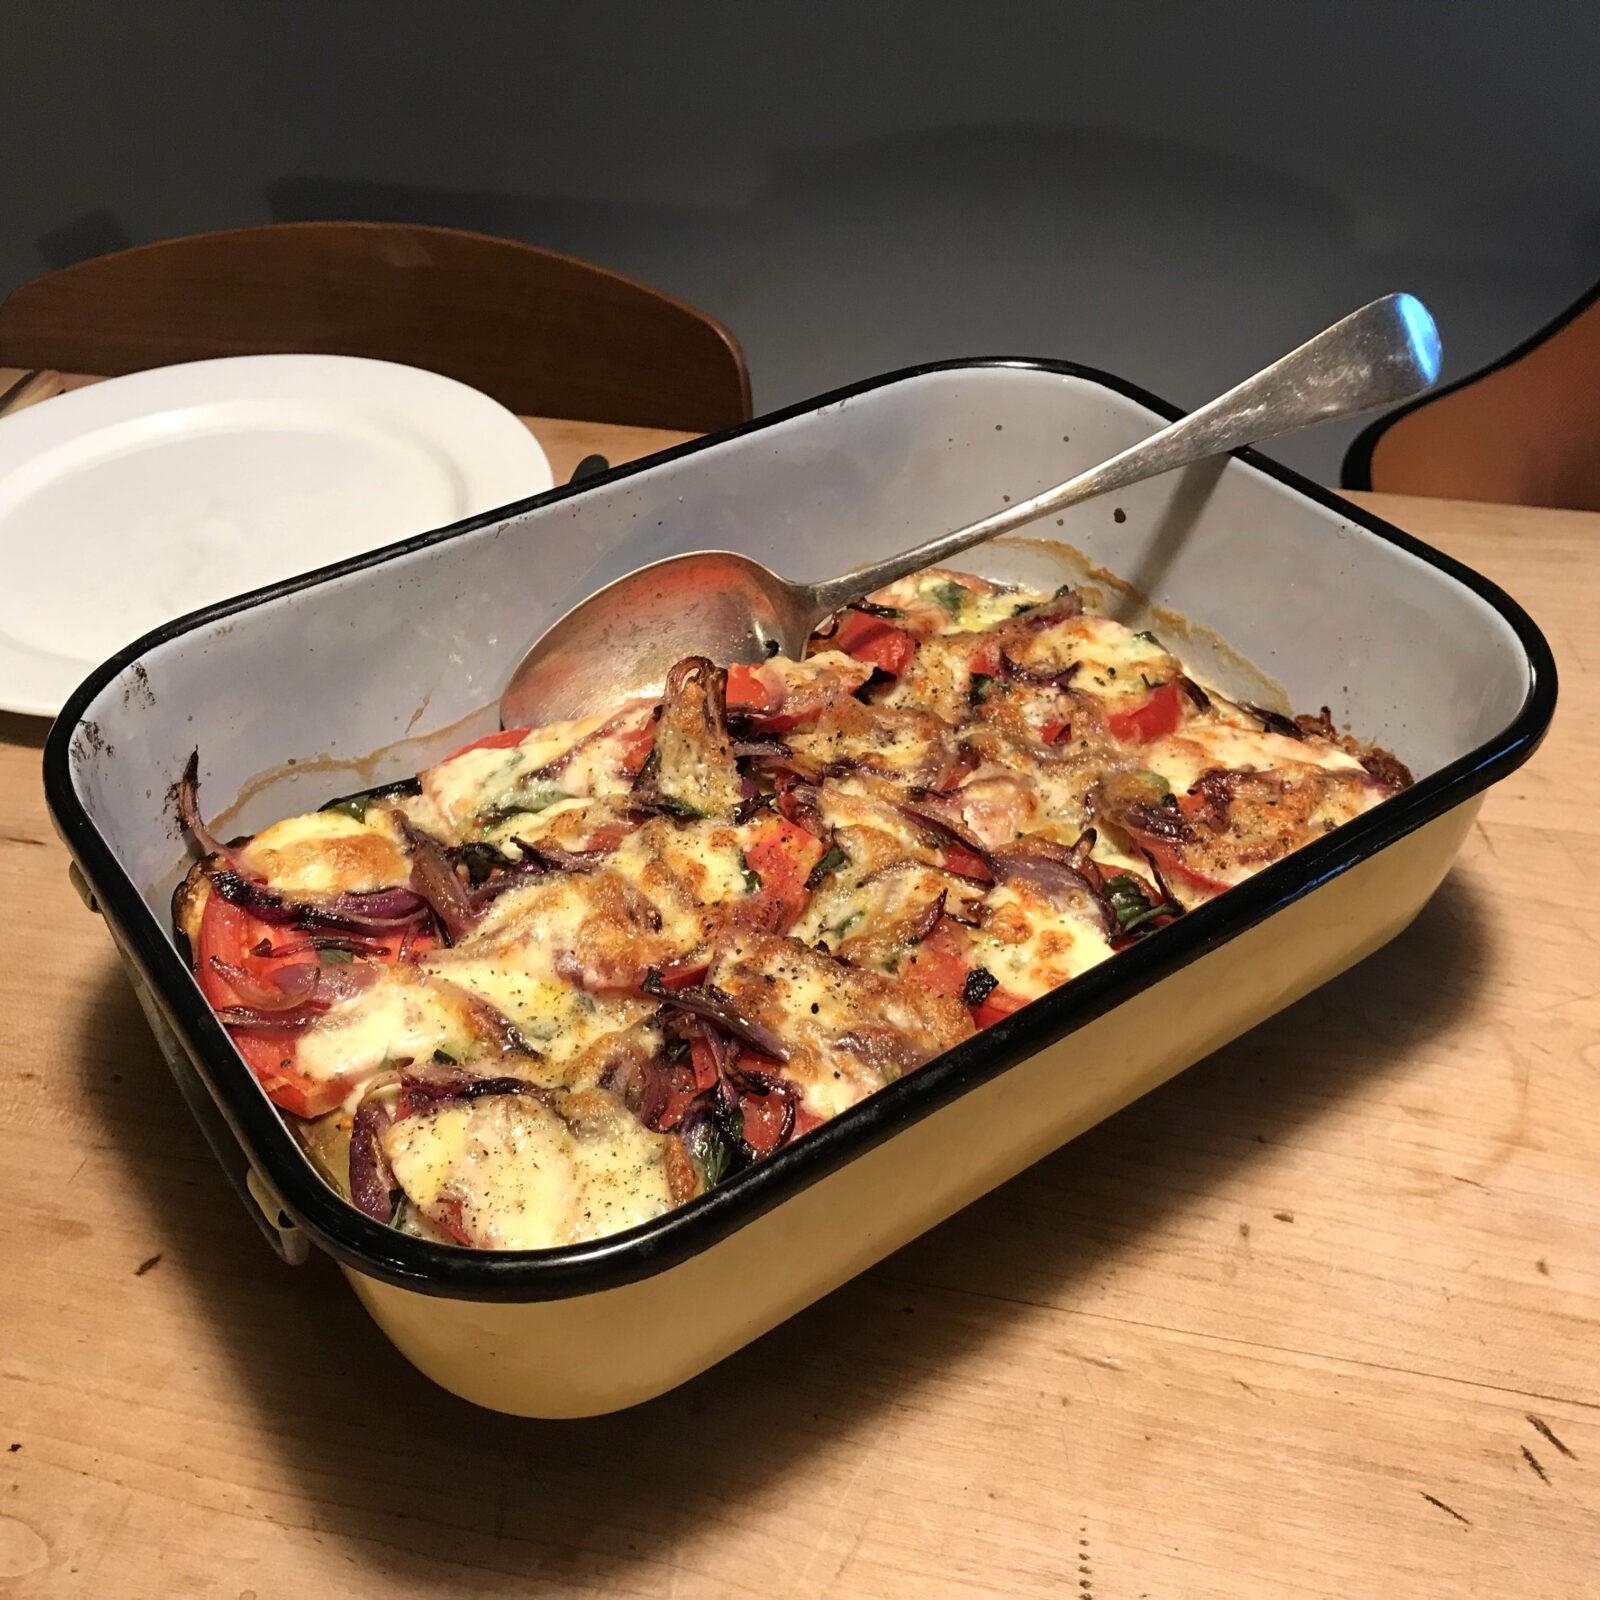 Auberginen Gratinata mit Tomaten und Mozzarella